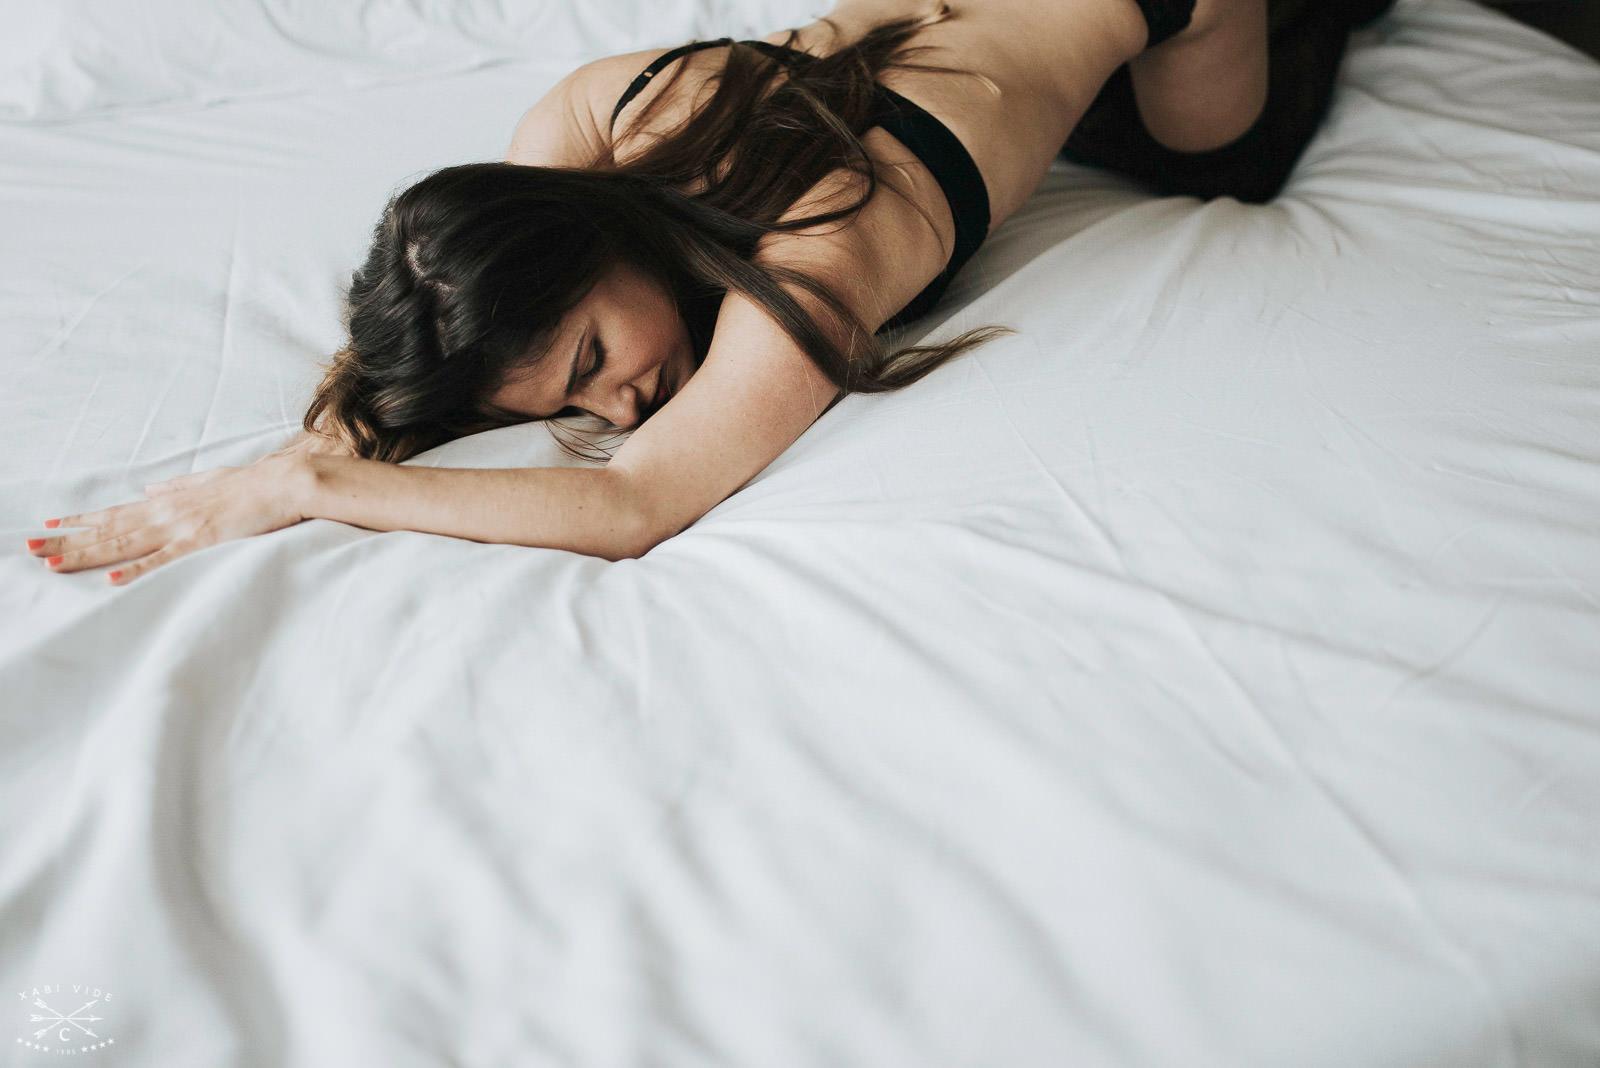 nagore fotografia boudoir en bilbao-24